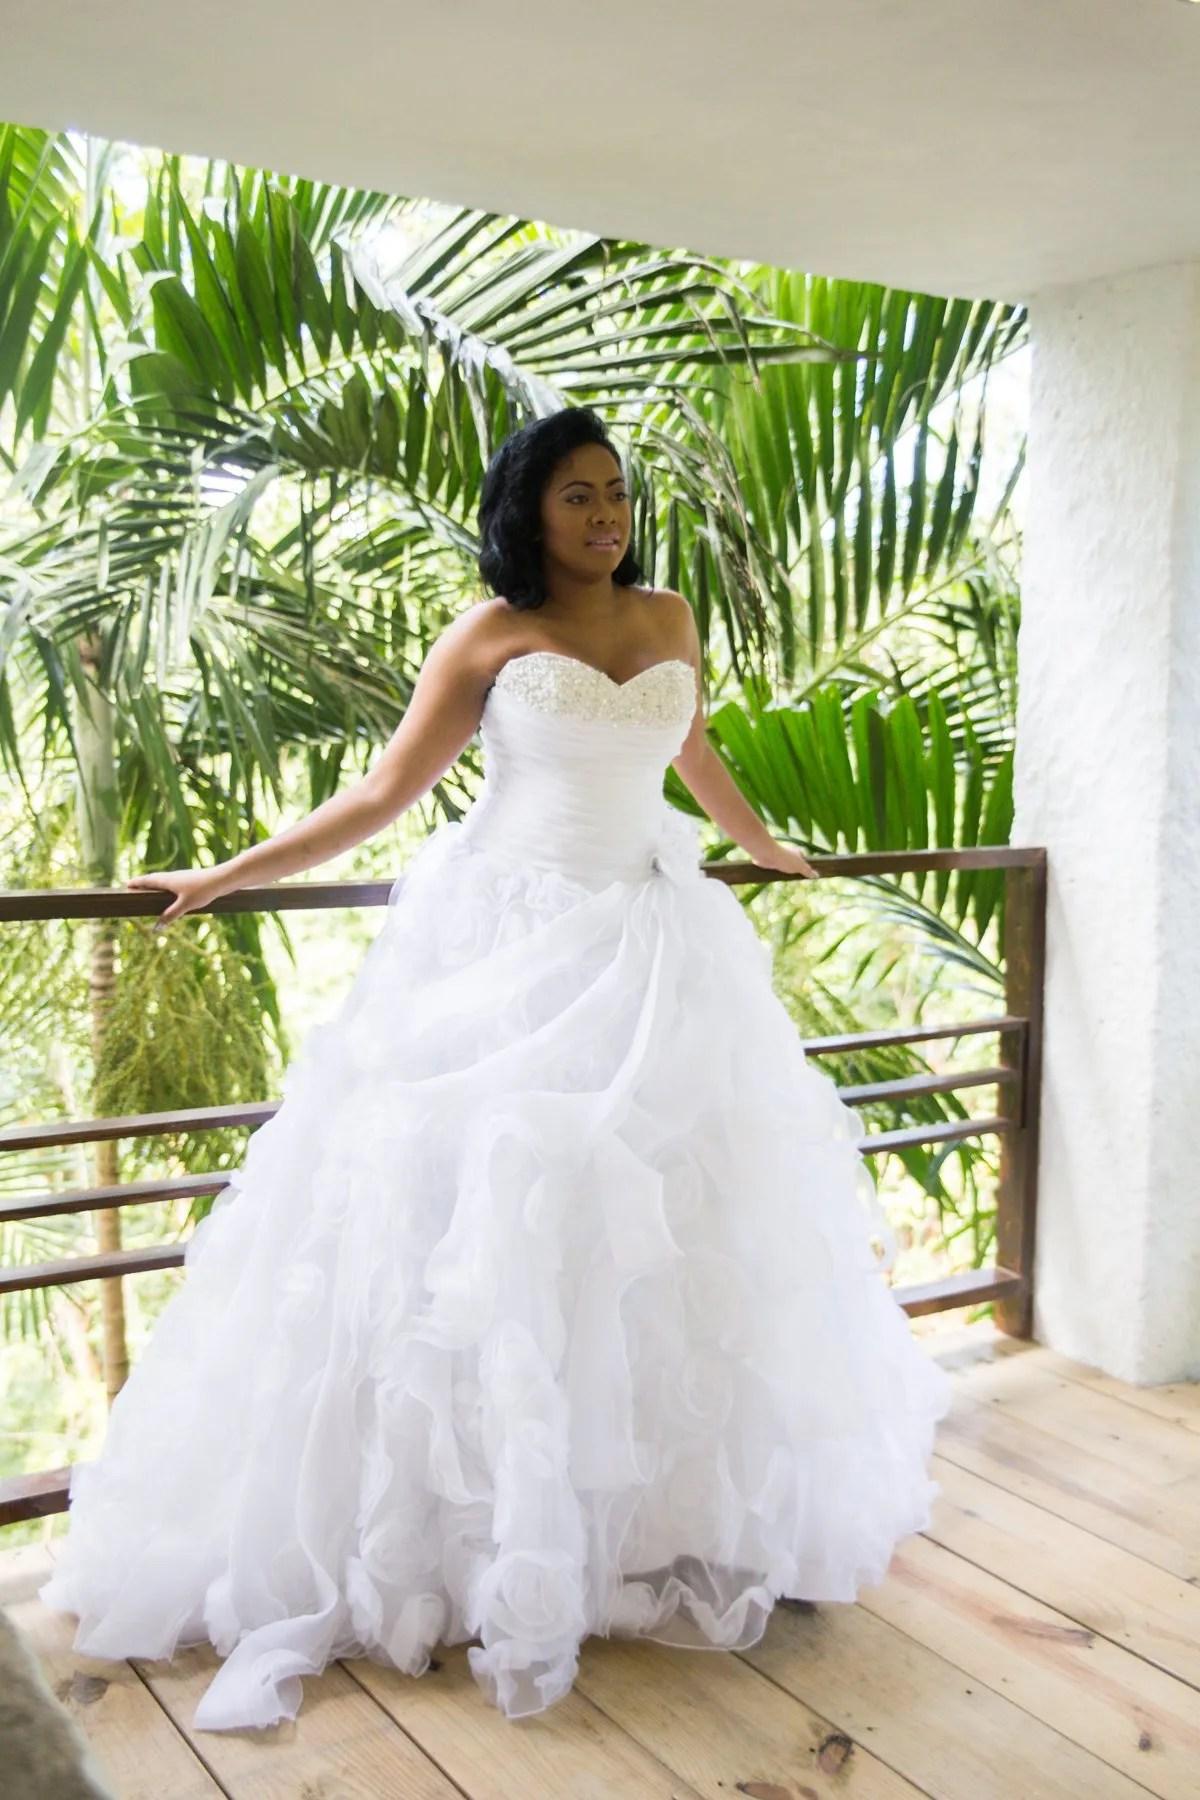 jamaican wedding dresses jamaican wedding dresses Jamaican Wedding Dress